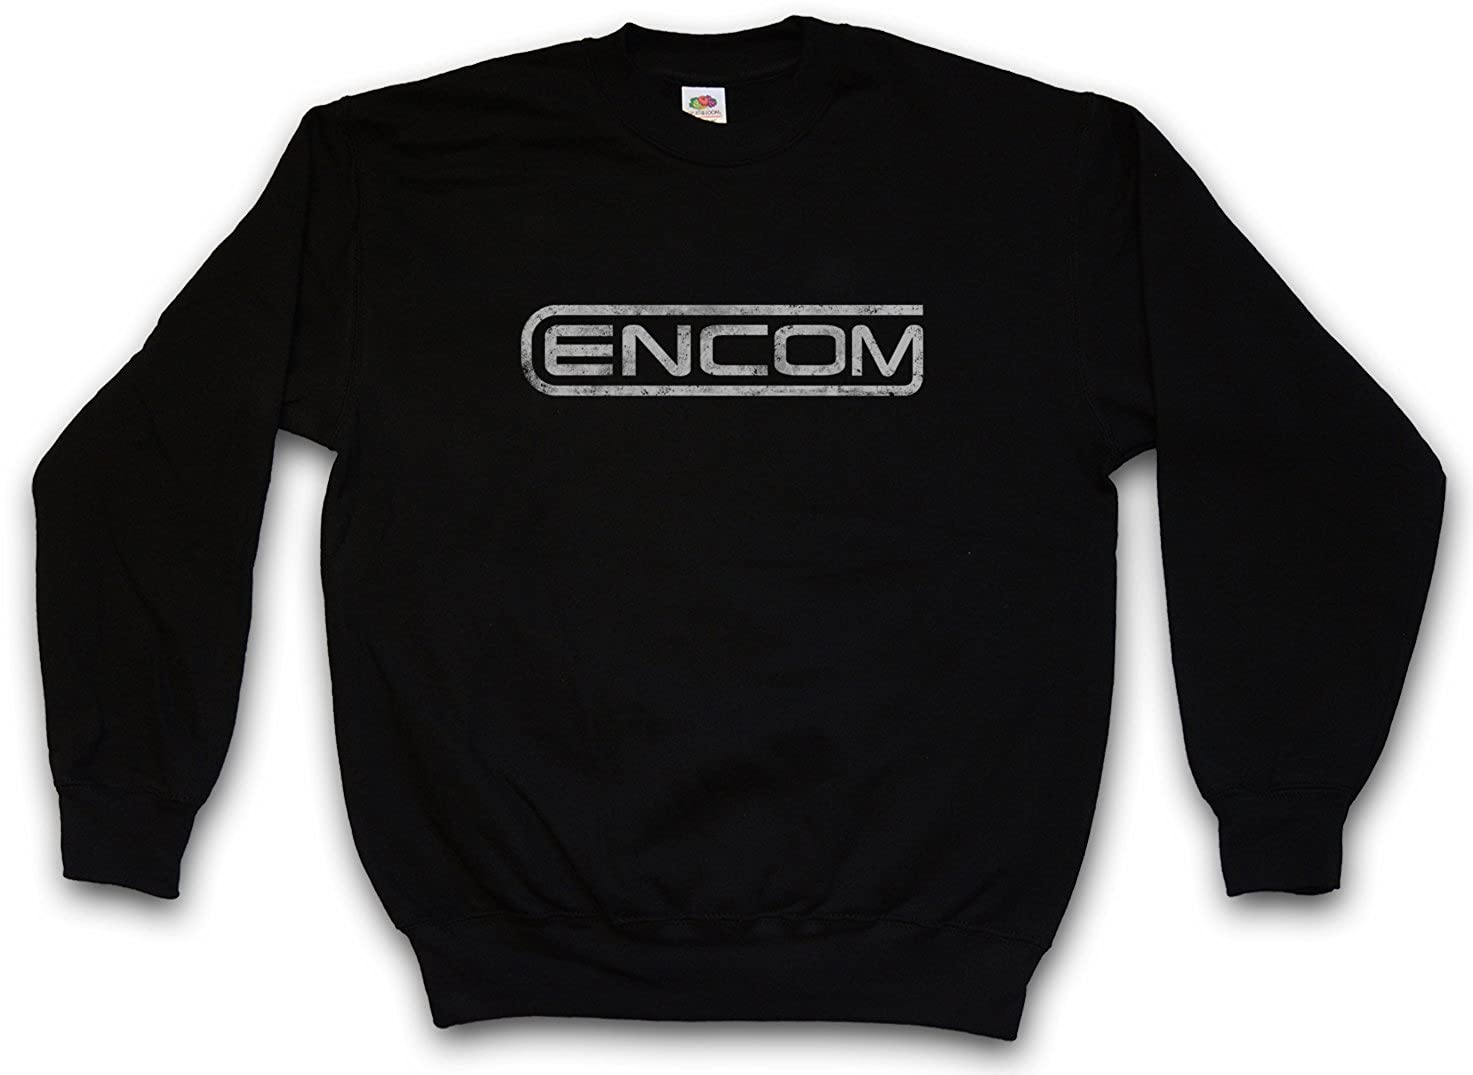 ENCOM II HOODIE encom International computer technology corporationTron MCP